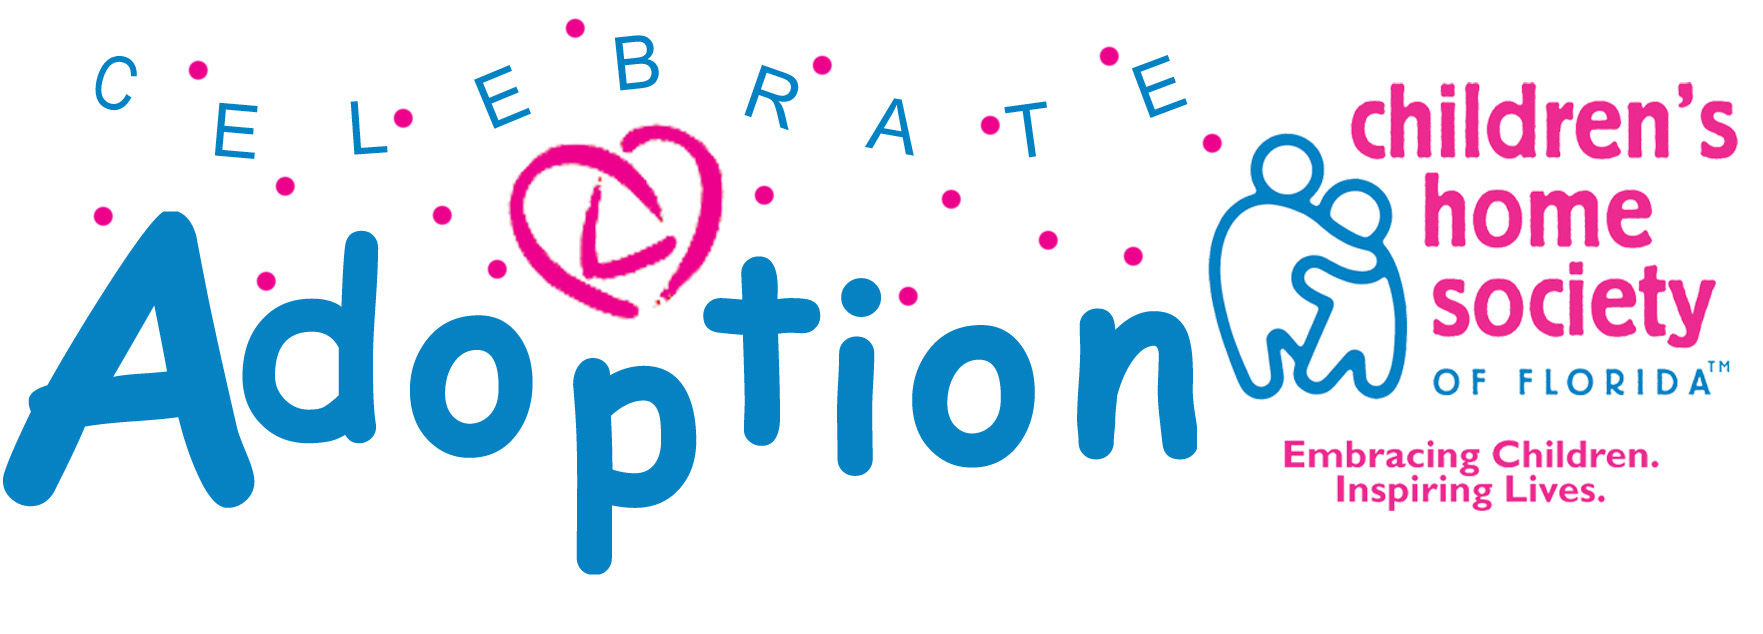 Celebrate Adoption